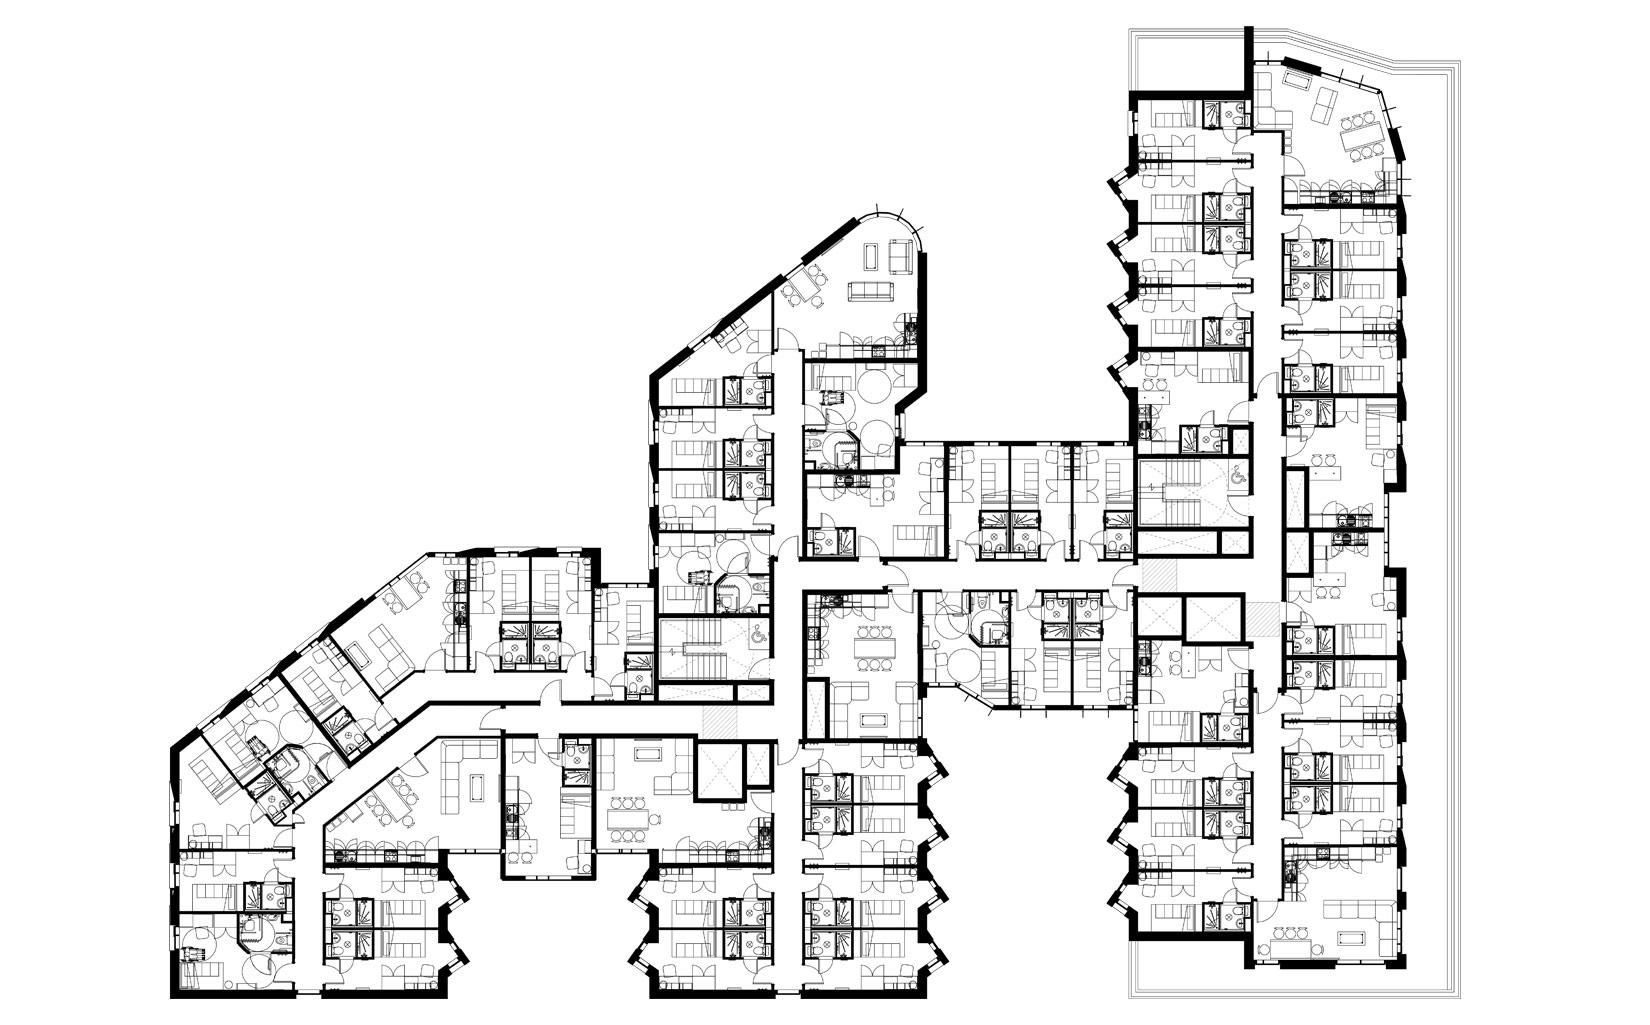 Technology Campus, Cookridge Street, Leeds, Floor Plan